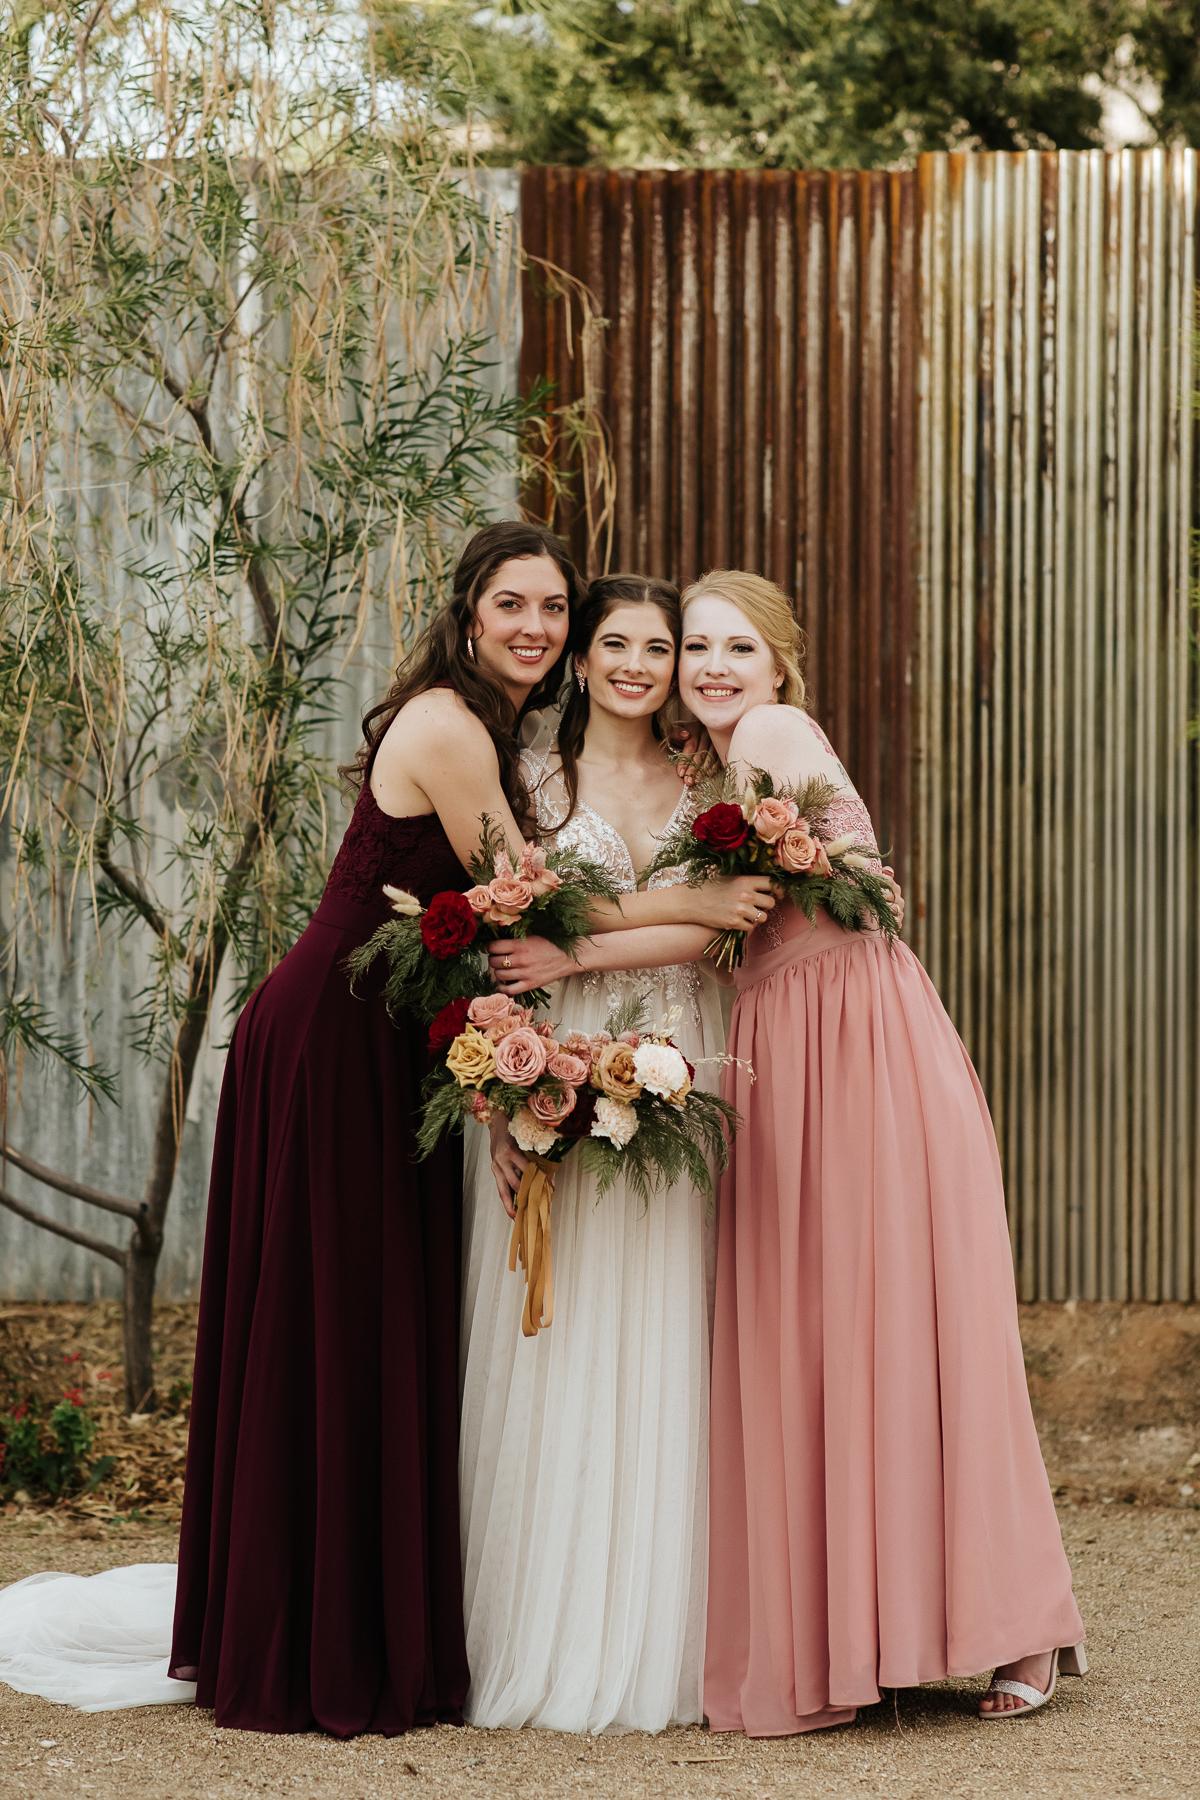 Megan Claire Photography | Arizona Wedding Photographer.  Rustic Glam Backyard Wedding. Maroon and Pink Bridal Party Photos